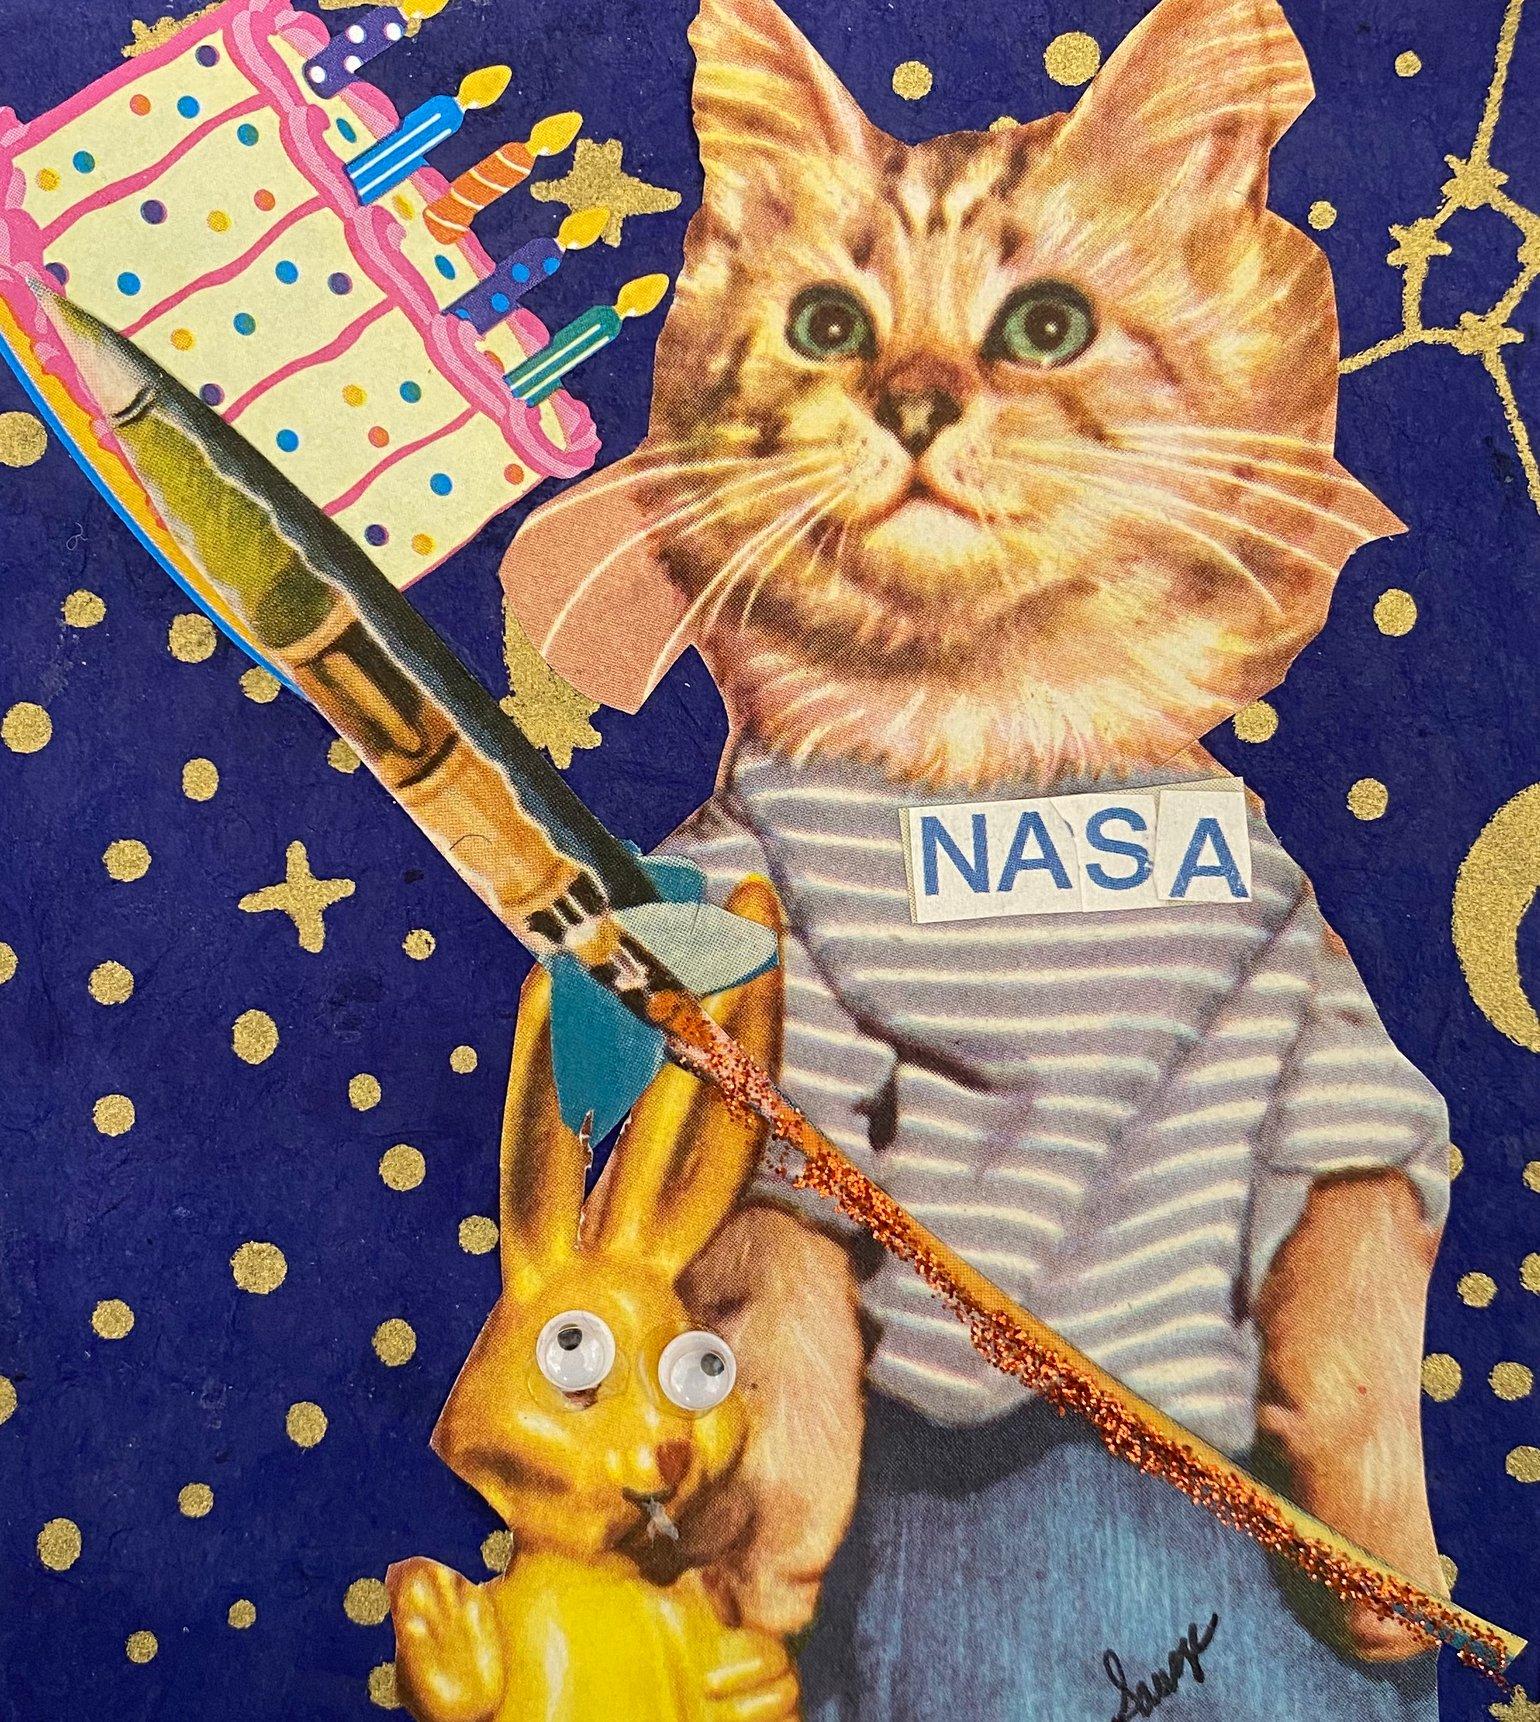 Image of NASA birthday